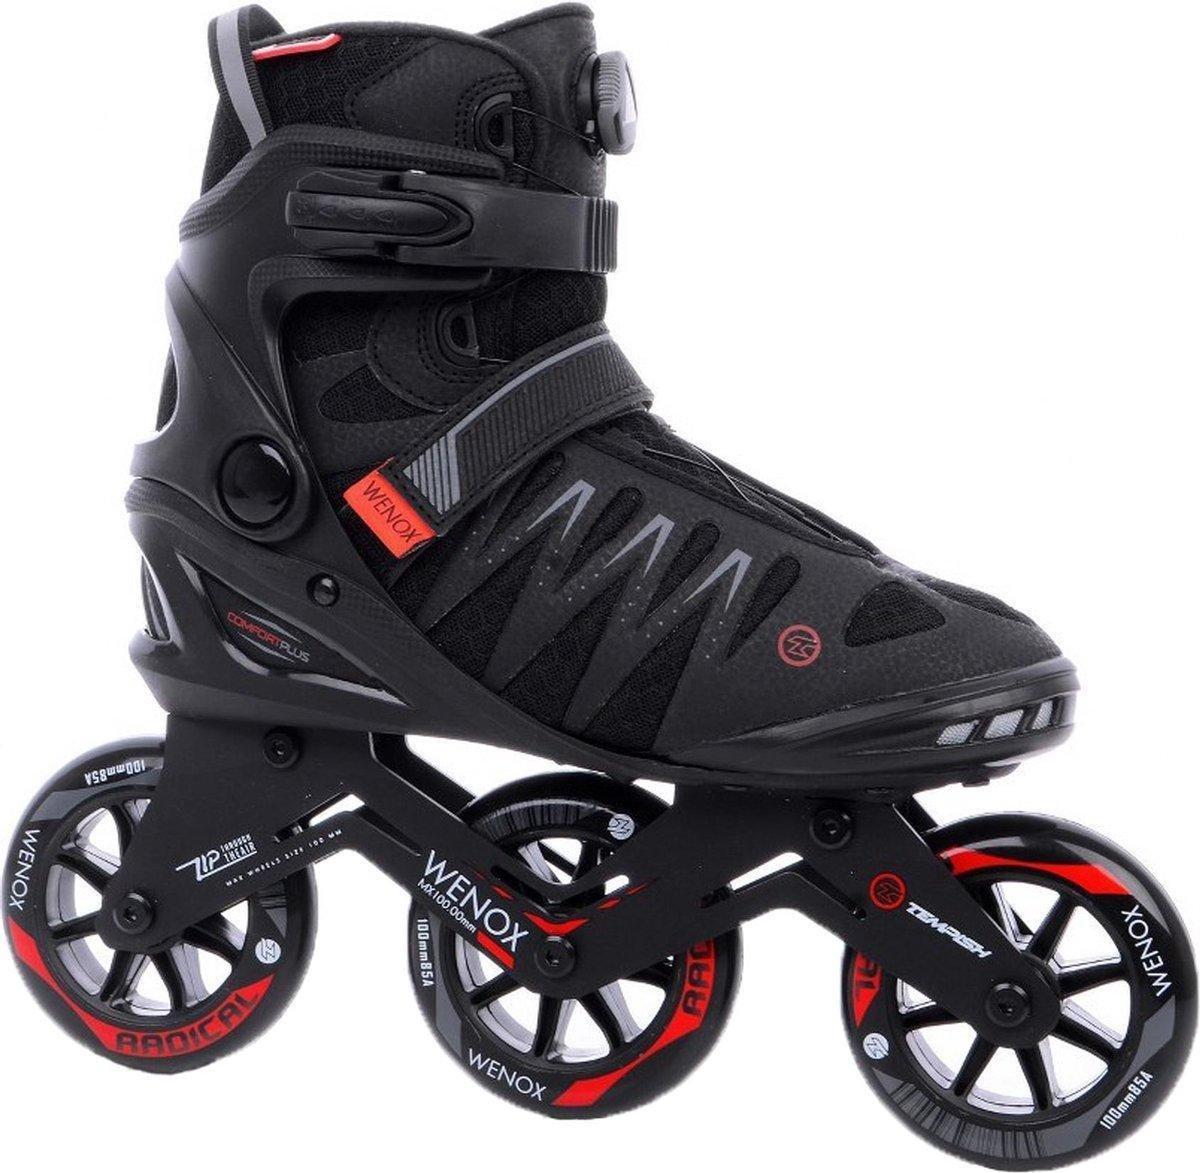 Tempish - Skeelers - Wenox - Top 100 - Zwart/Rood - Maat 39 - Heren - Skates